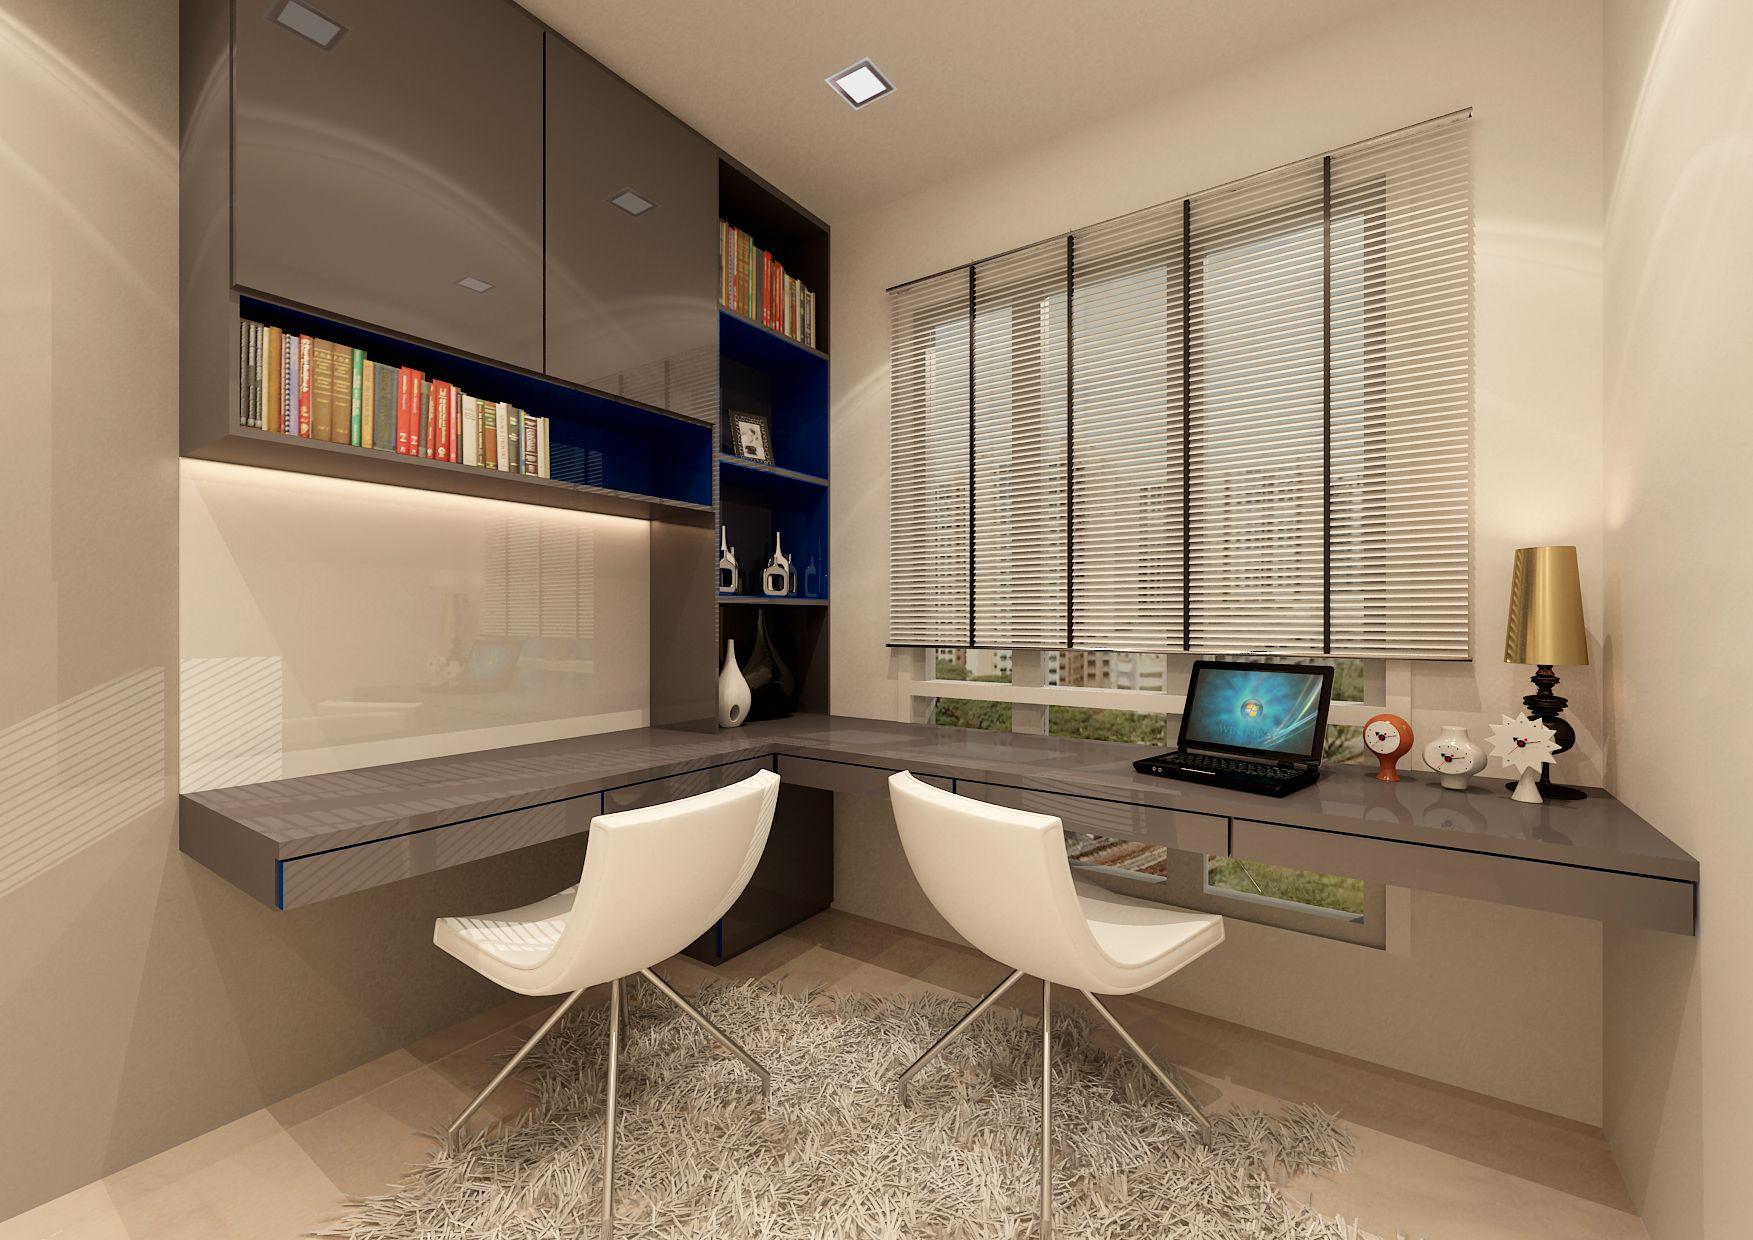 Adorable black storage room design furniture inspiration brilliant